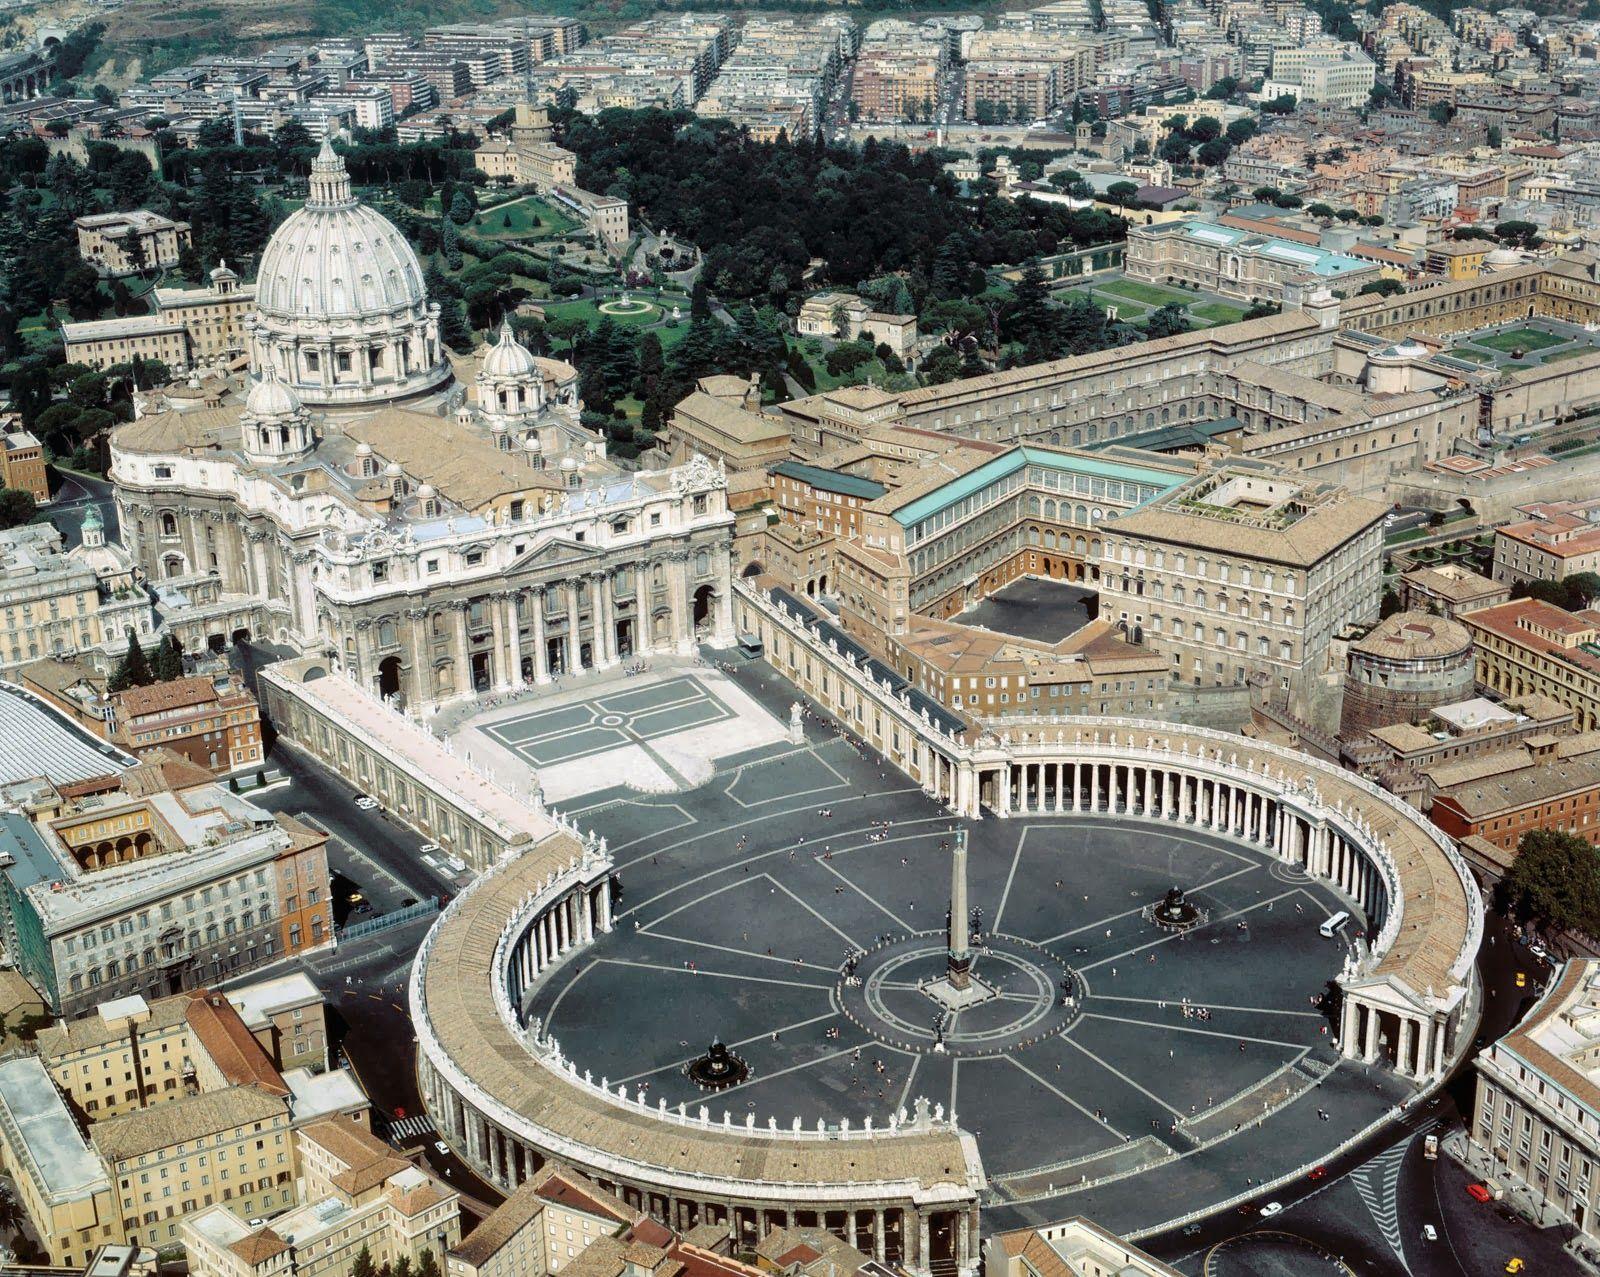 saint peter s basilica and piazza vatican vatican city rome saint peter s basilica and piazza vatican vatican city rome